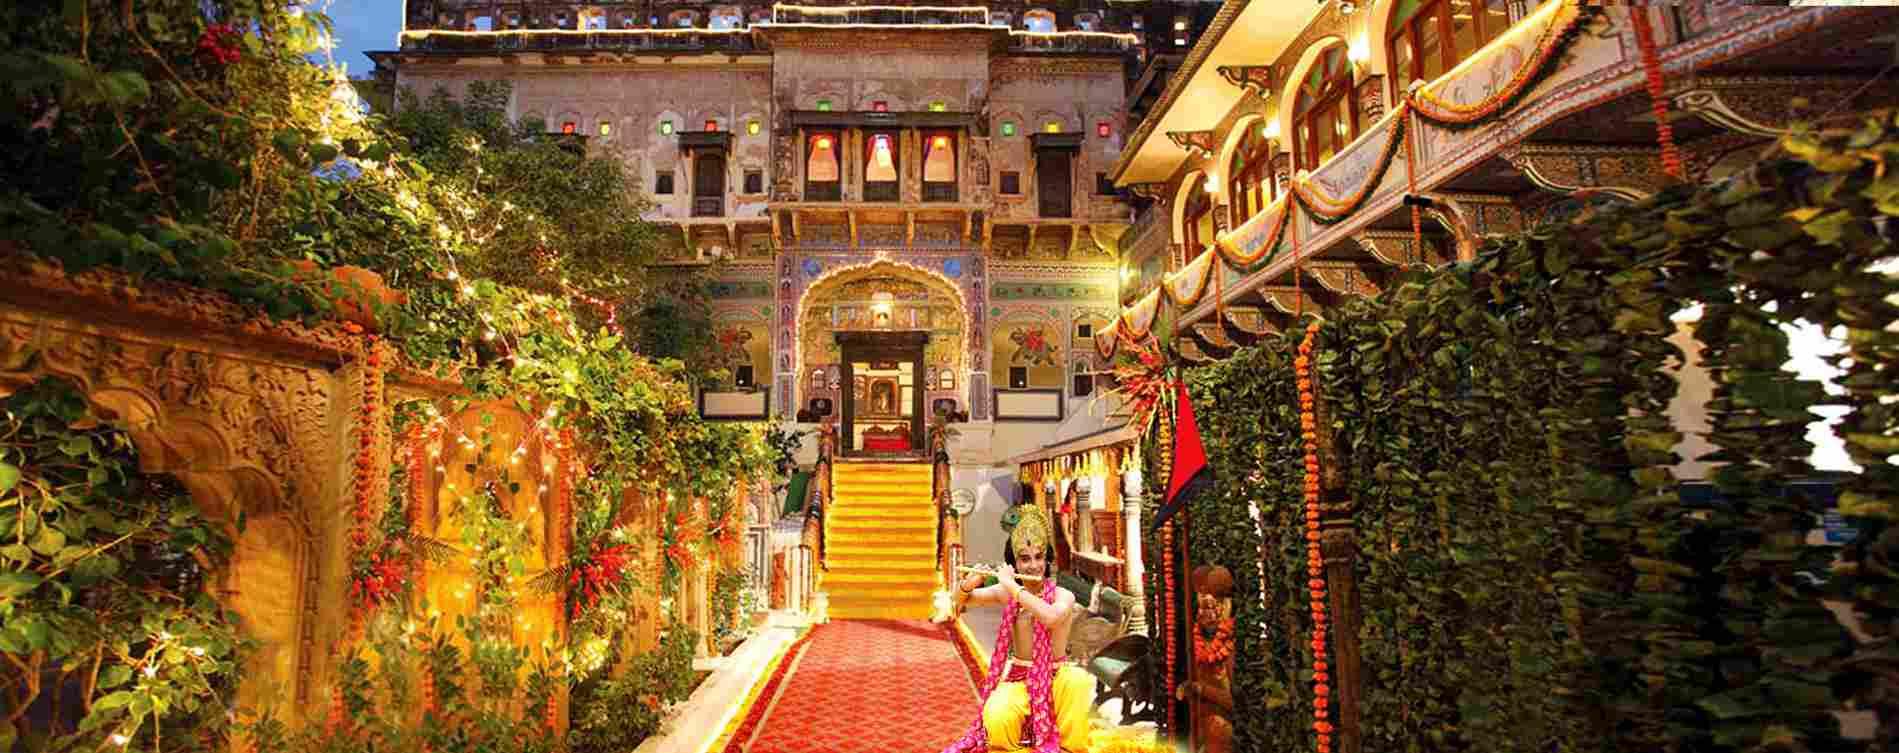 http://www.hotelmandawahaveli.com/wp-content/uploads/2016/08/banner1-1.jpg